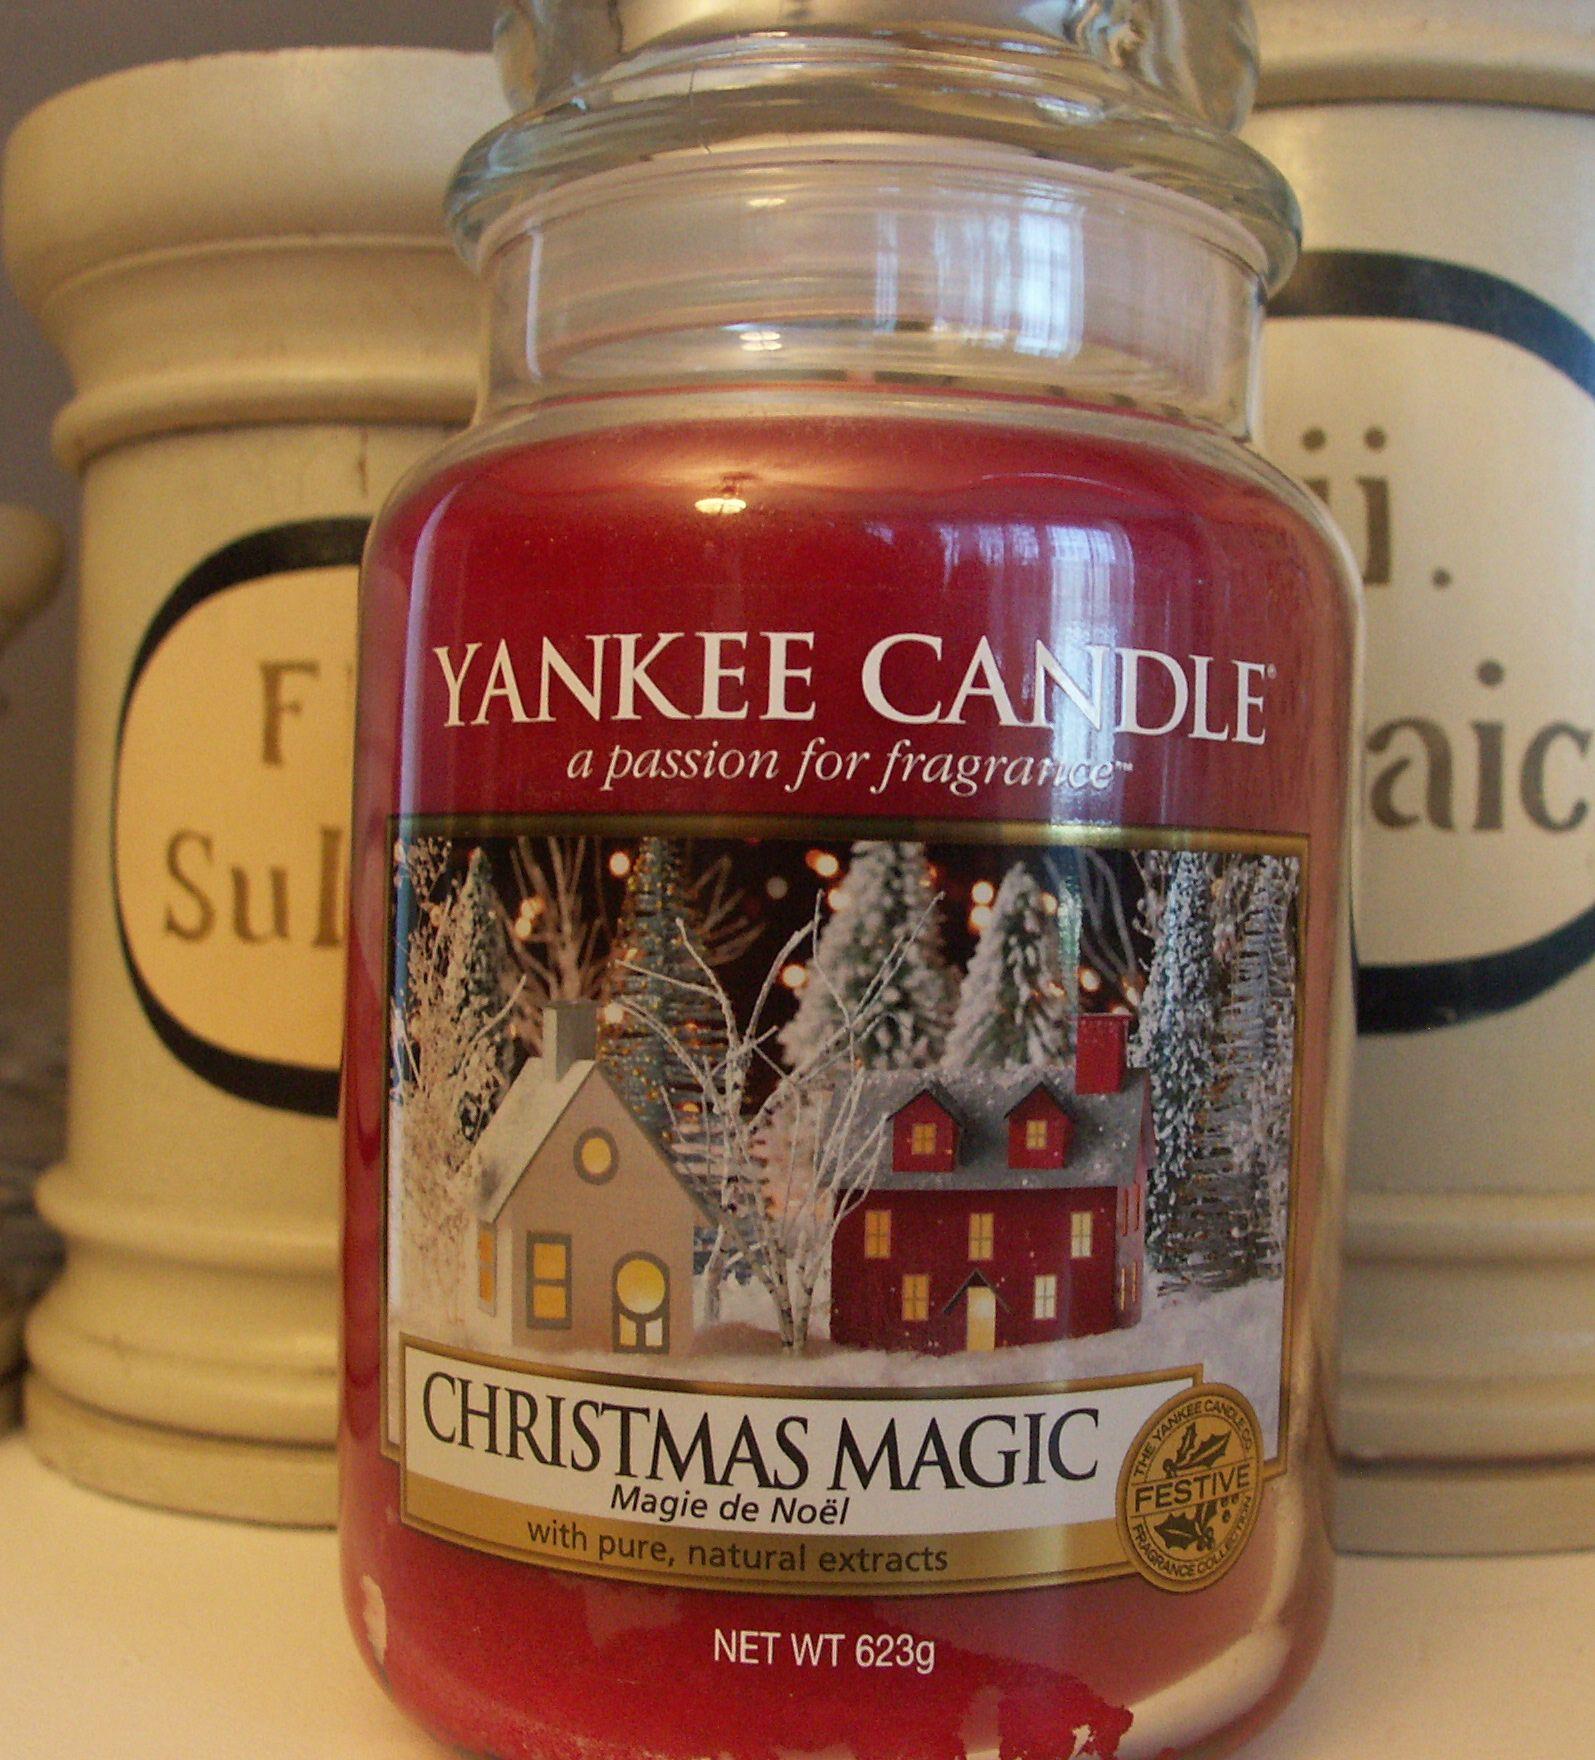 Yankee Candle Christmas Magic In 2020 Yankee Candle Christmas Yankee Candle Candles